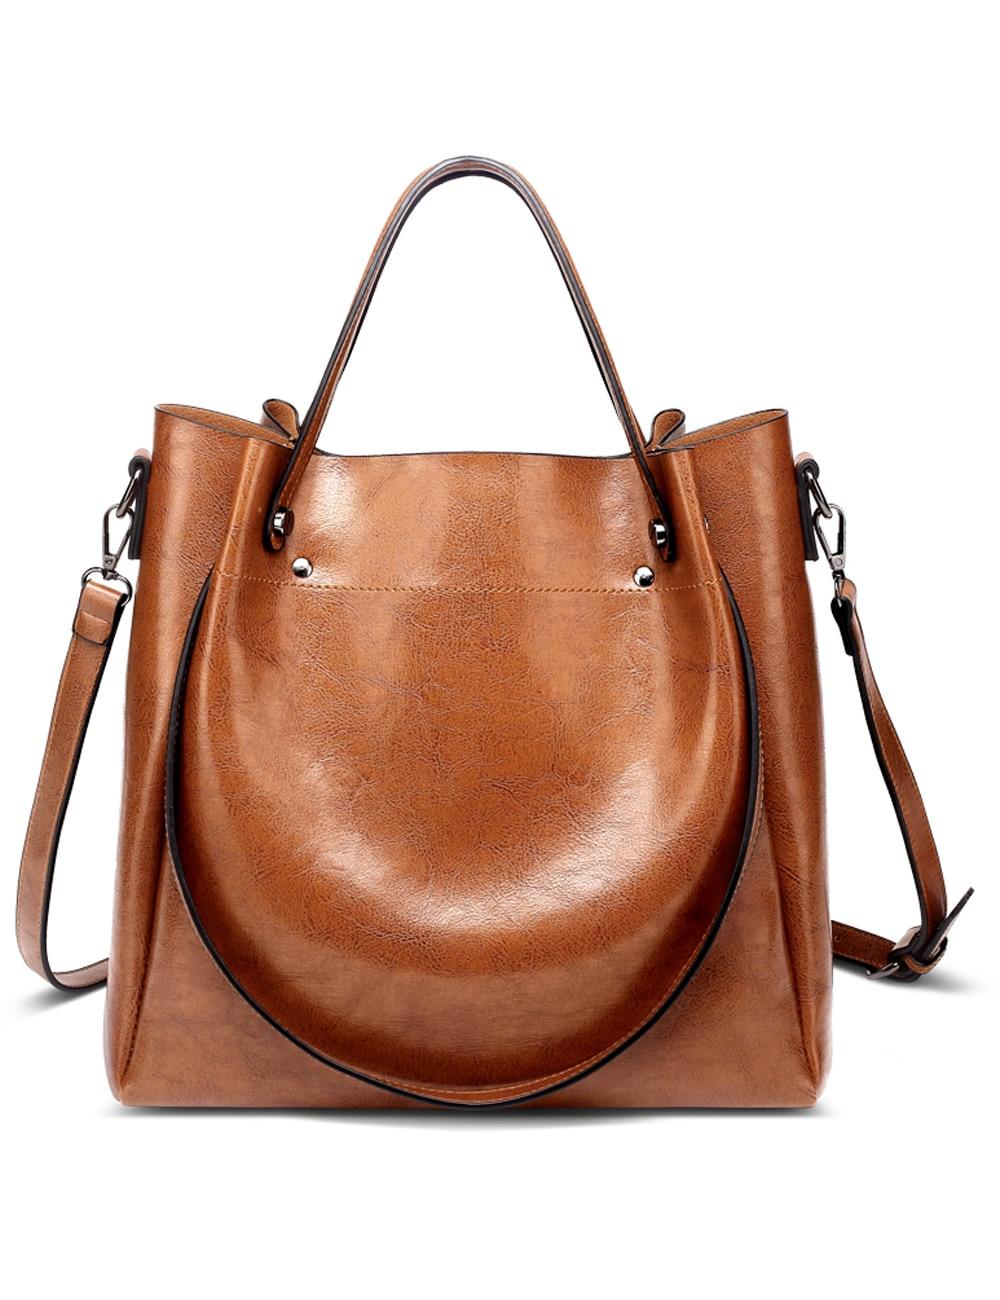 Menschwear Women Handbag Shoulder Bags Oil Wax Women Leather Handbags Bucket Bag Female Crossbody Bag bolsa feminina LSH042 oil wax cow leather handbag brand 2018 bolsa feminina new women 100